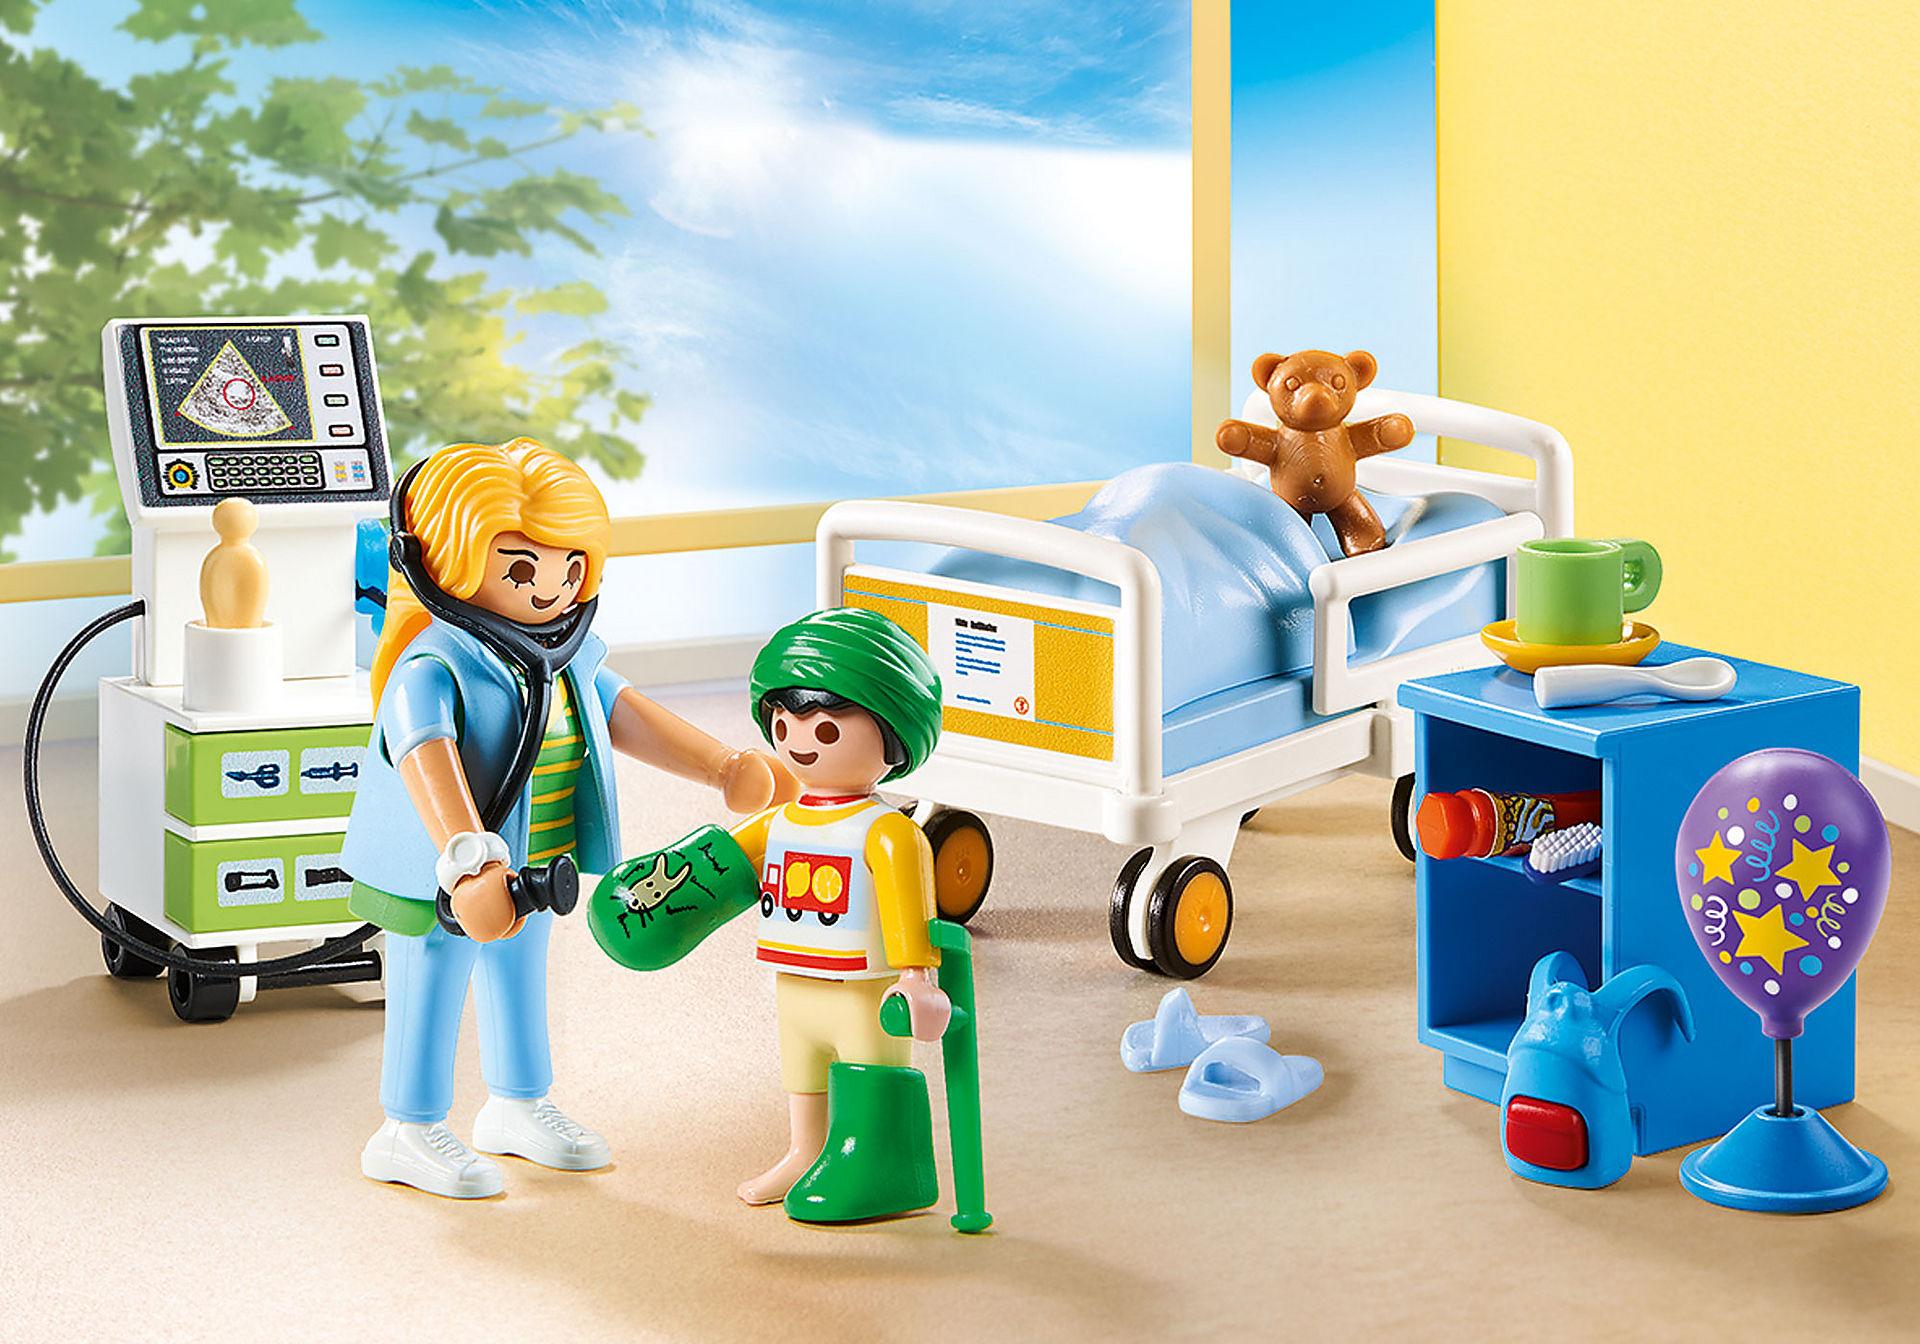 70192 Children's Hospital Room zoom image1